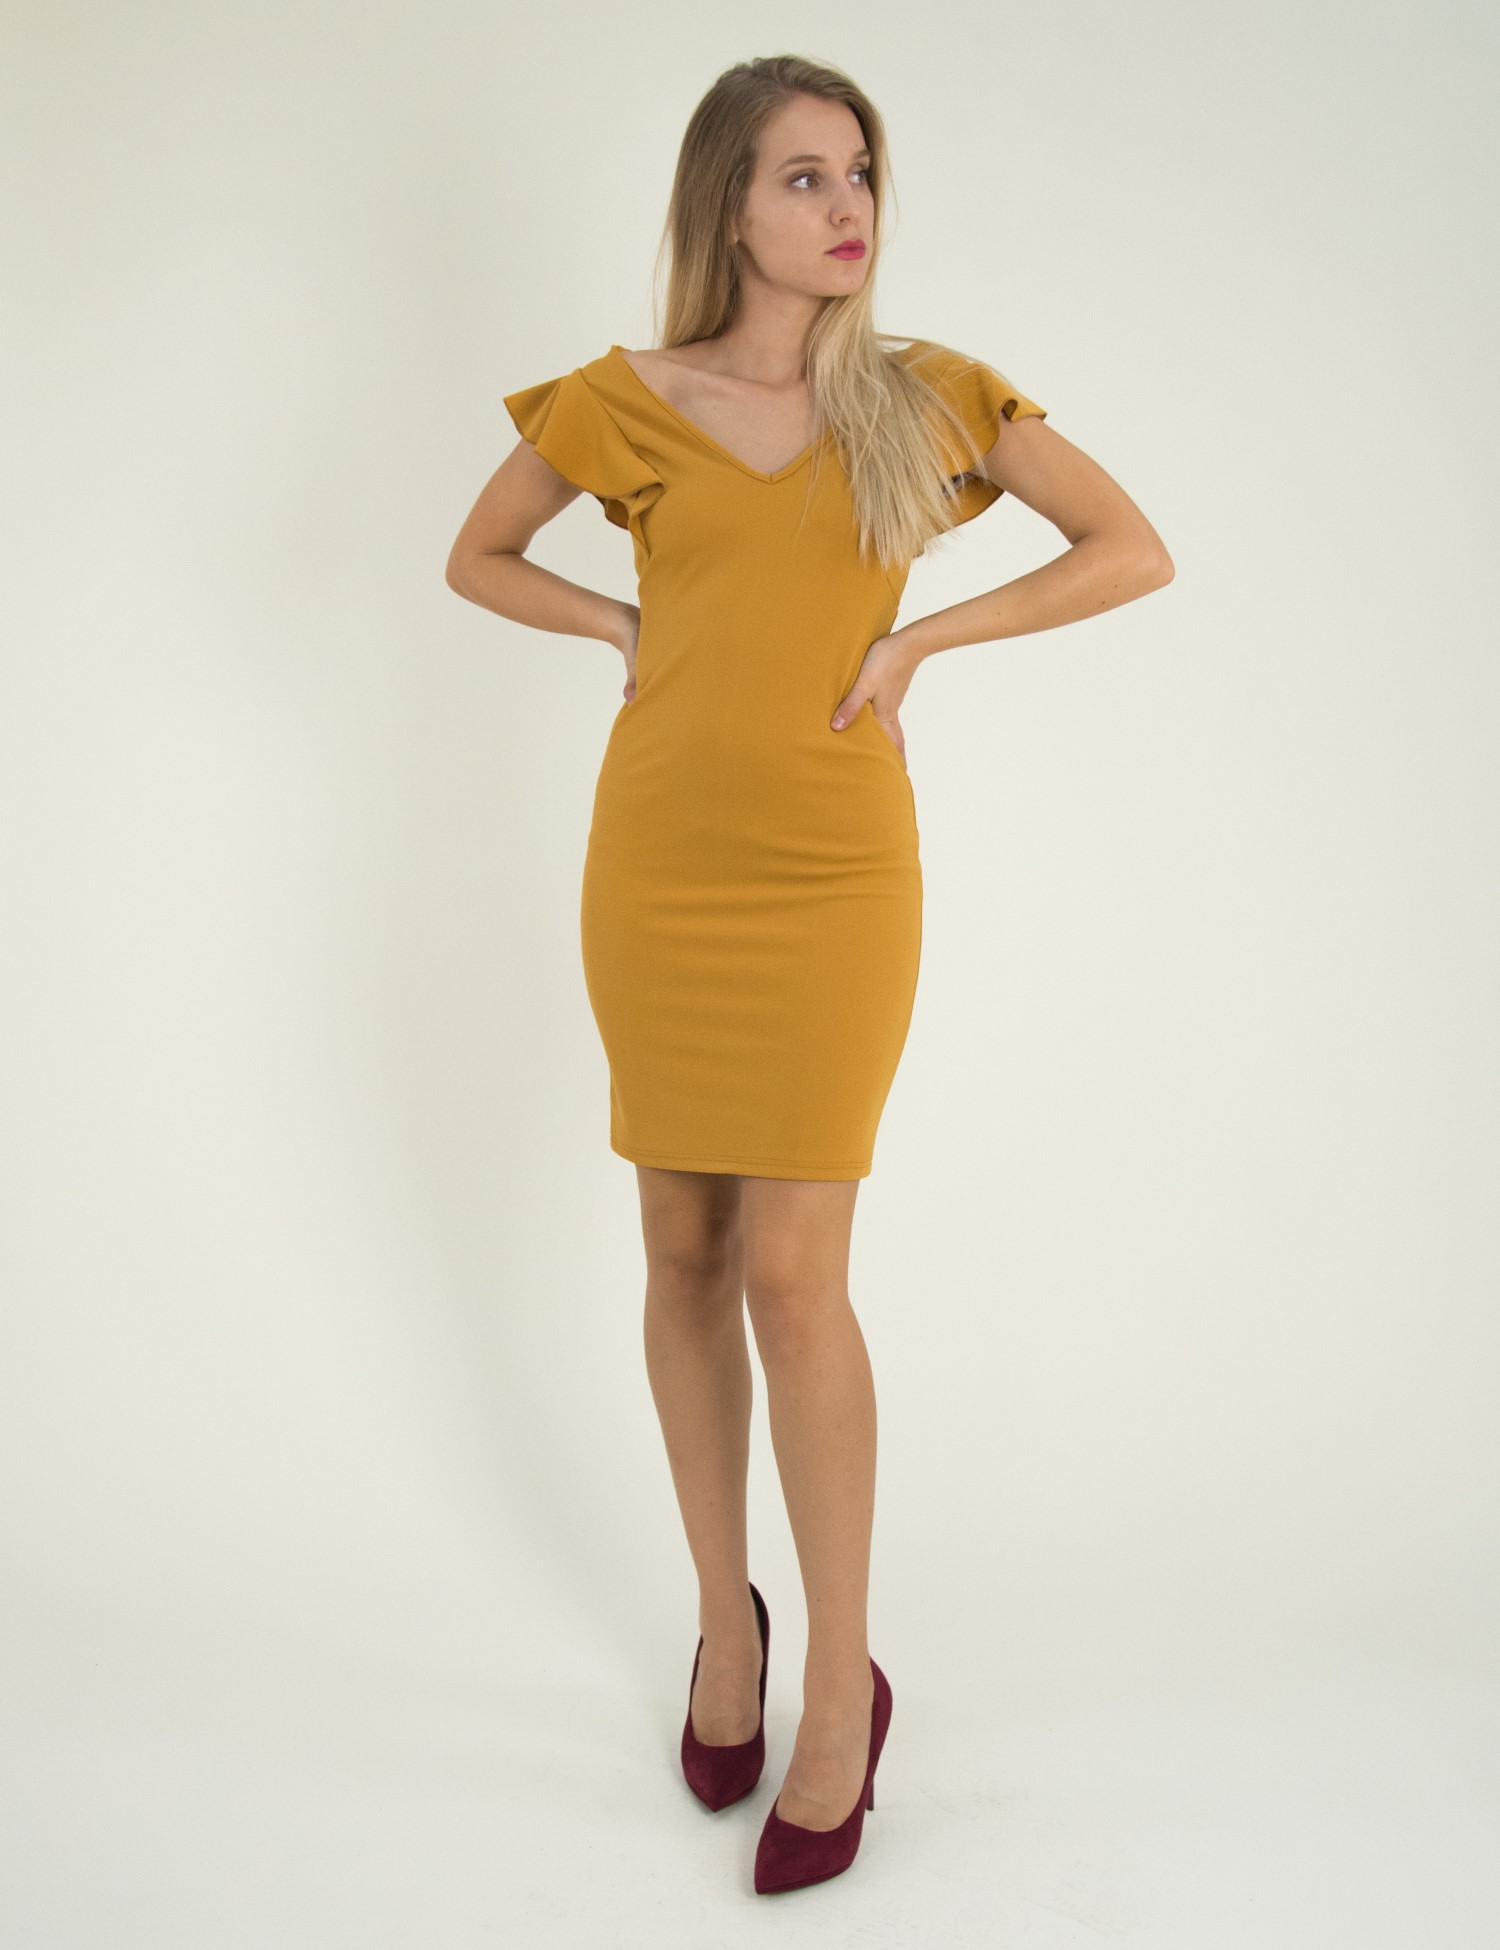 7dc0d9dbe11 Torouxo Γυναικείο ώχρα μονόχρωμο Scuba φόρεμα βολάν 8295129C